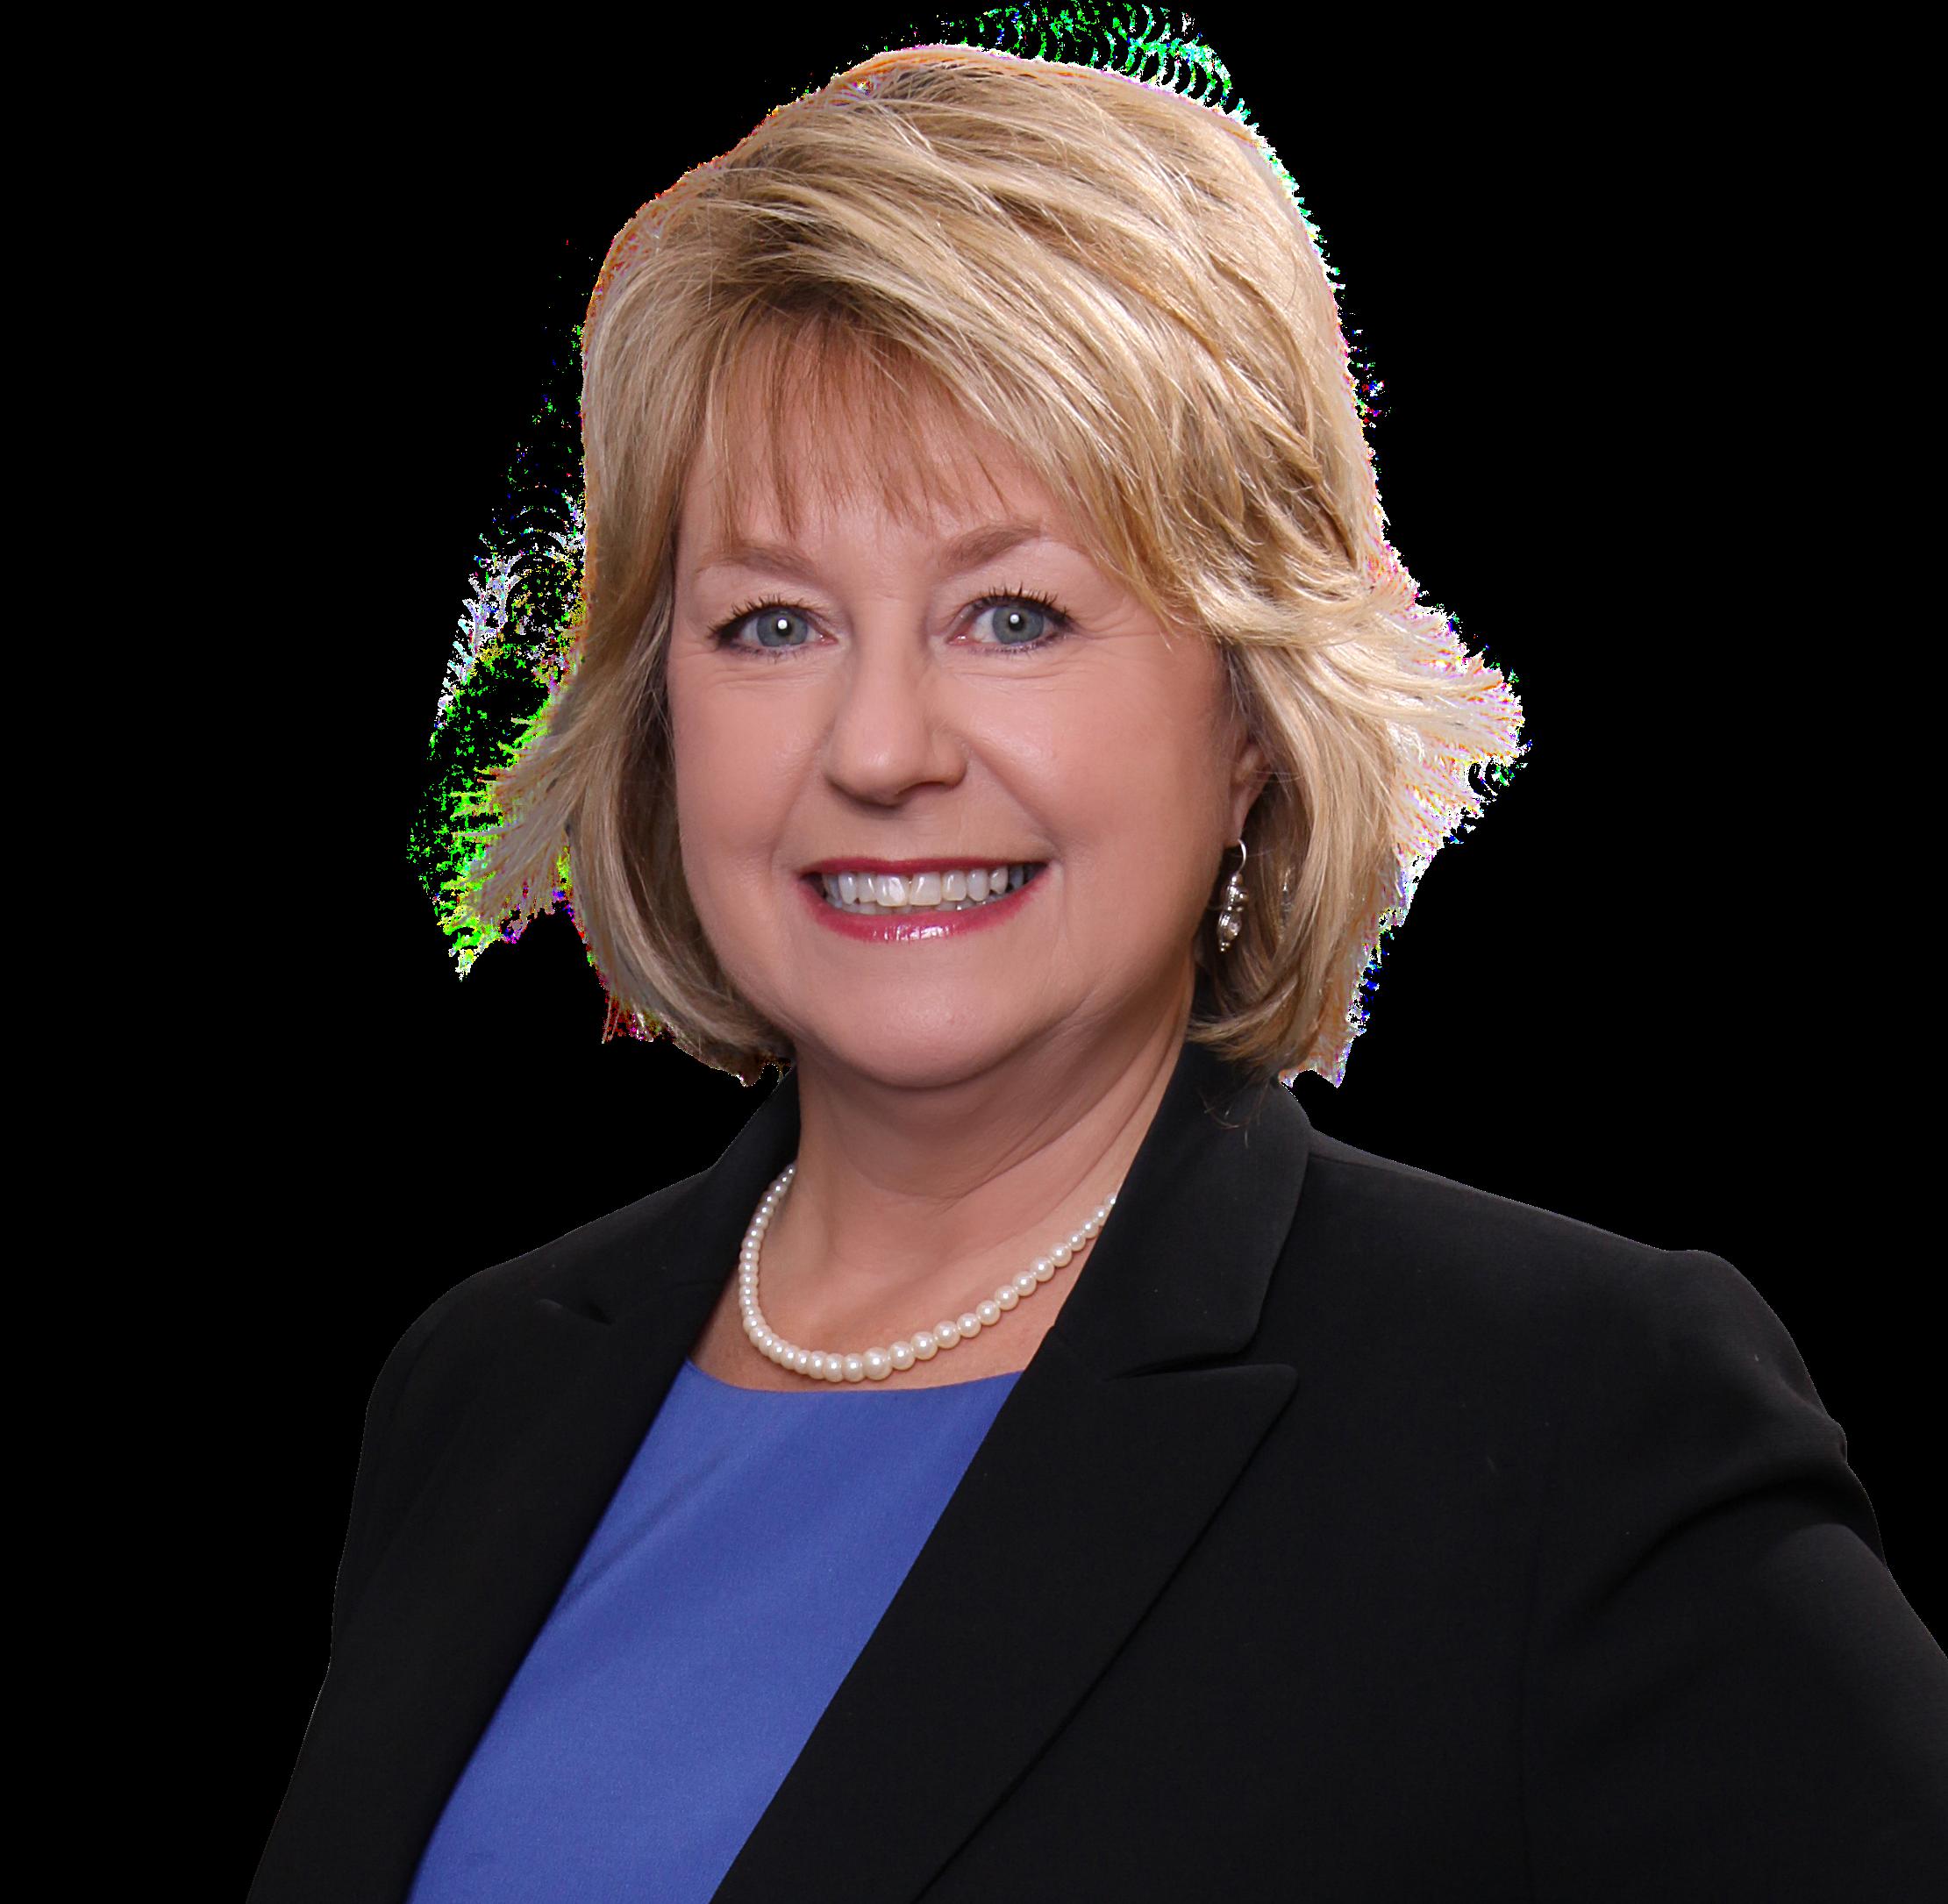 Kathy Venable